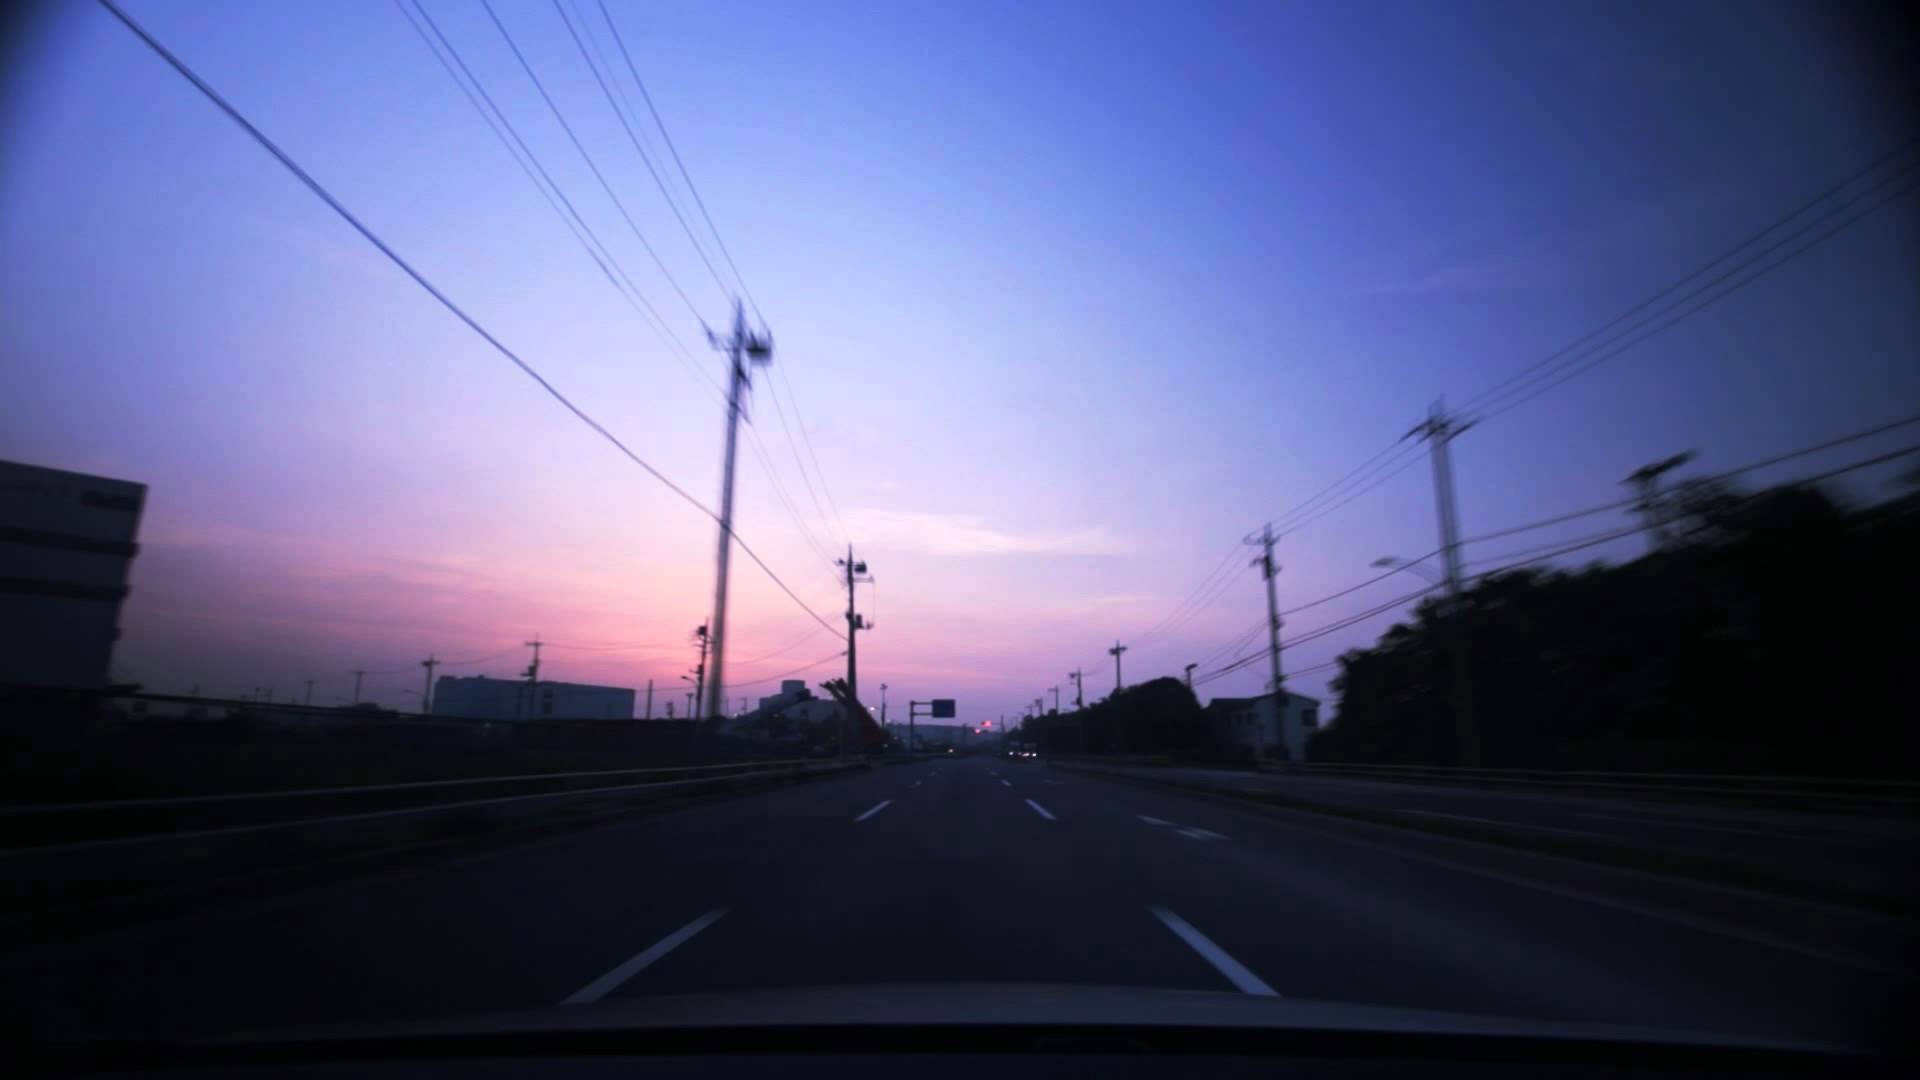 (HD) Morning drive in Tokyo 12 -早朝の羽田空港周辺ドライブ (SKETCH ver.)-